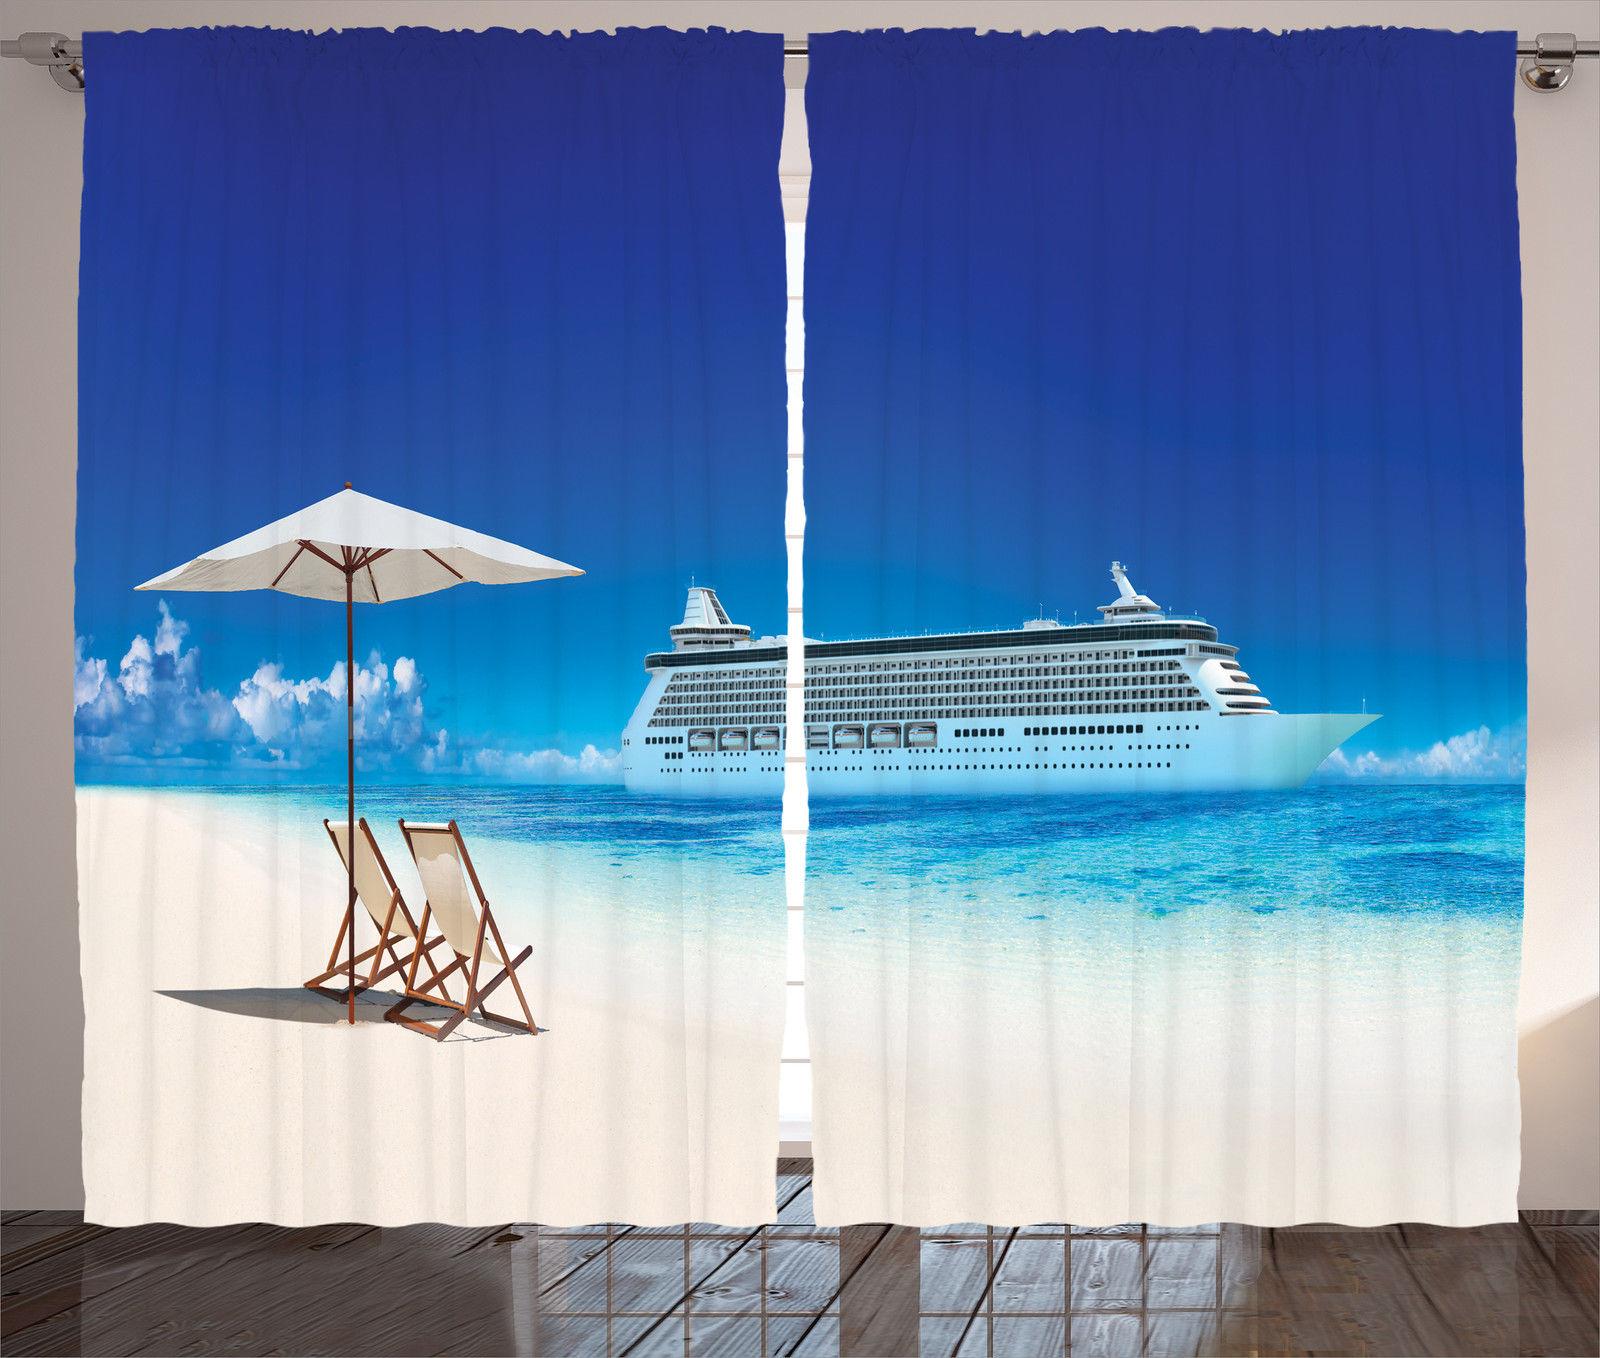 Cloud Window Curtains 3d Printing Nautical Home Decor: Ocean Beach Cruise Ship Nautical Decor Great Outdoor Image